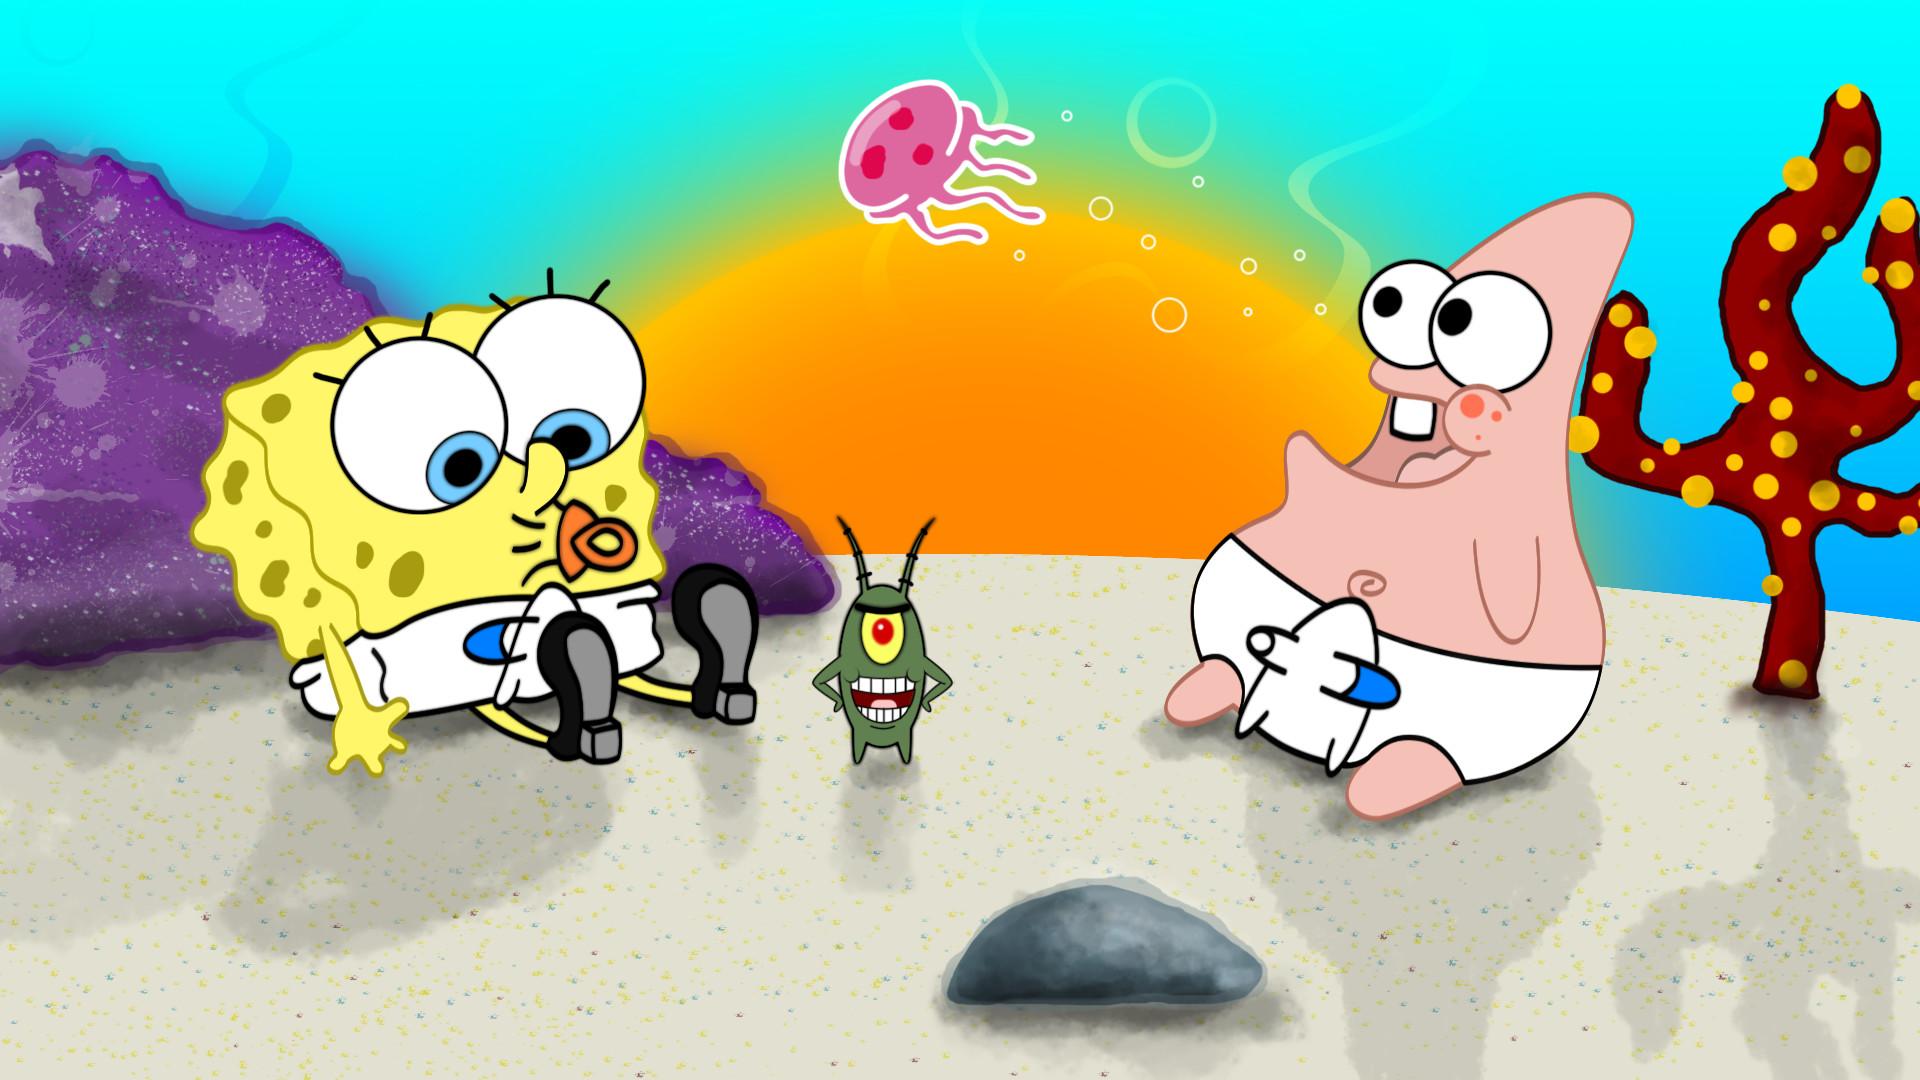 Tags: cartoon, SpongeBob Squarepants